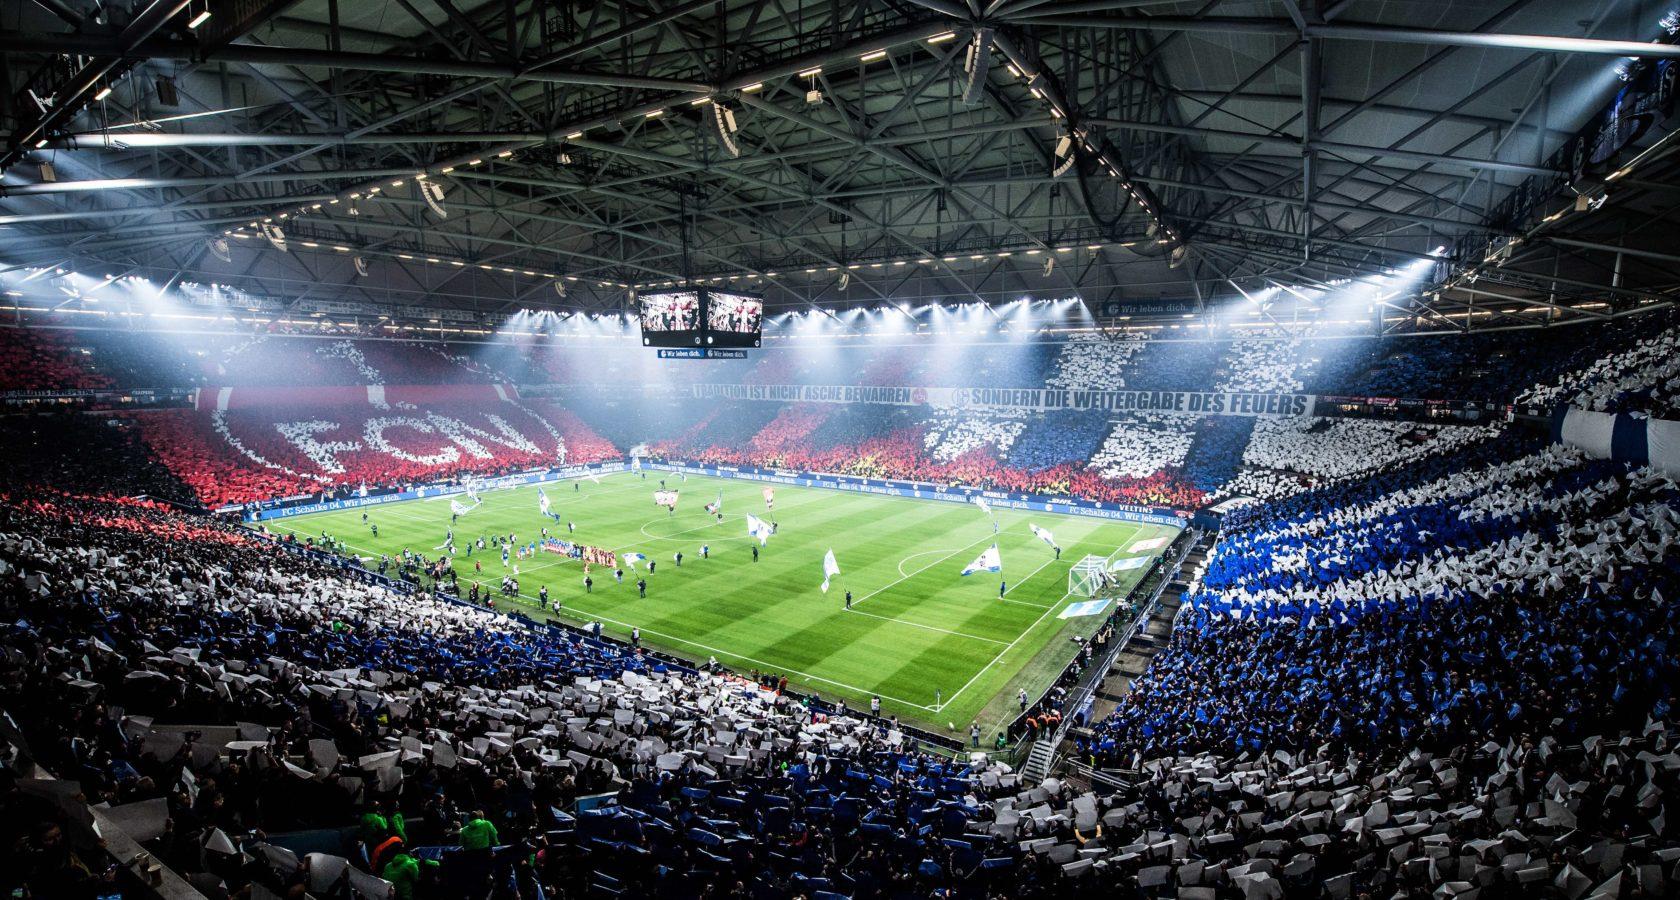 FC Schalke 04 v 1. FC Nuernberg – Bundesliga